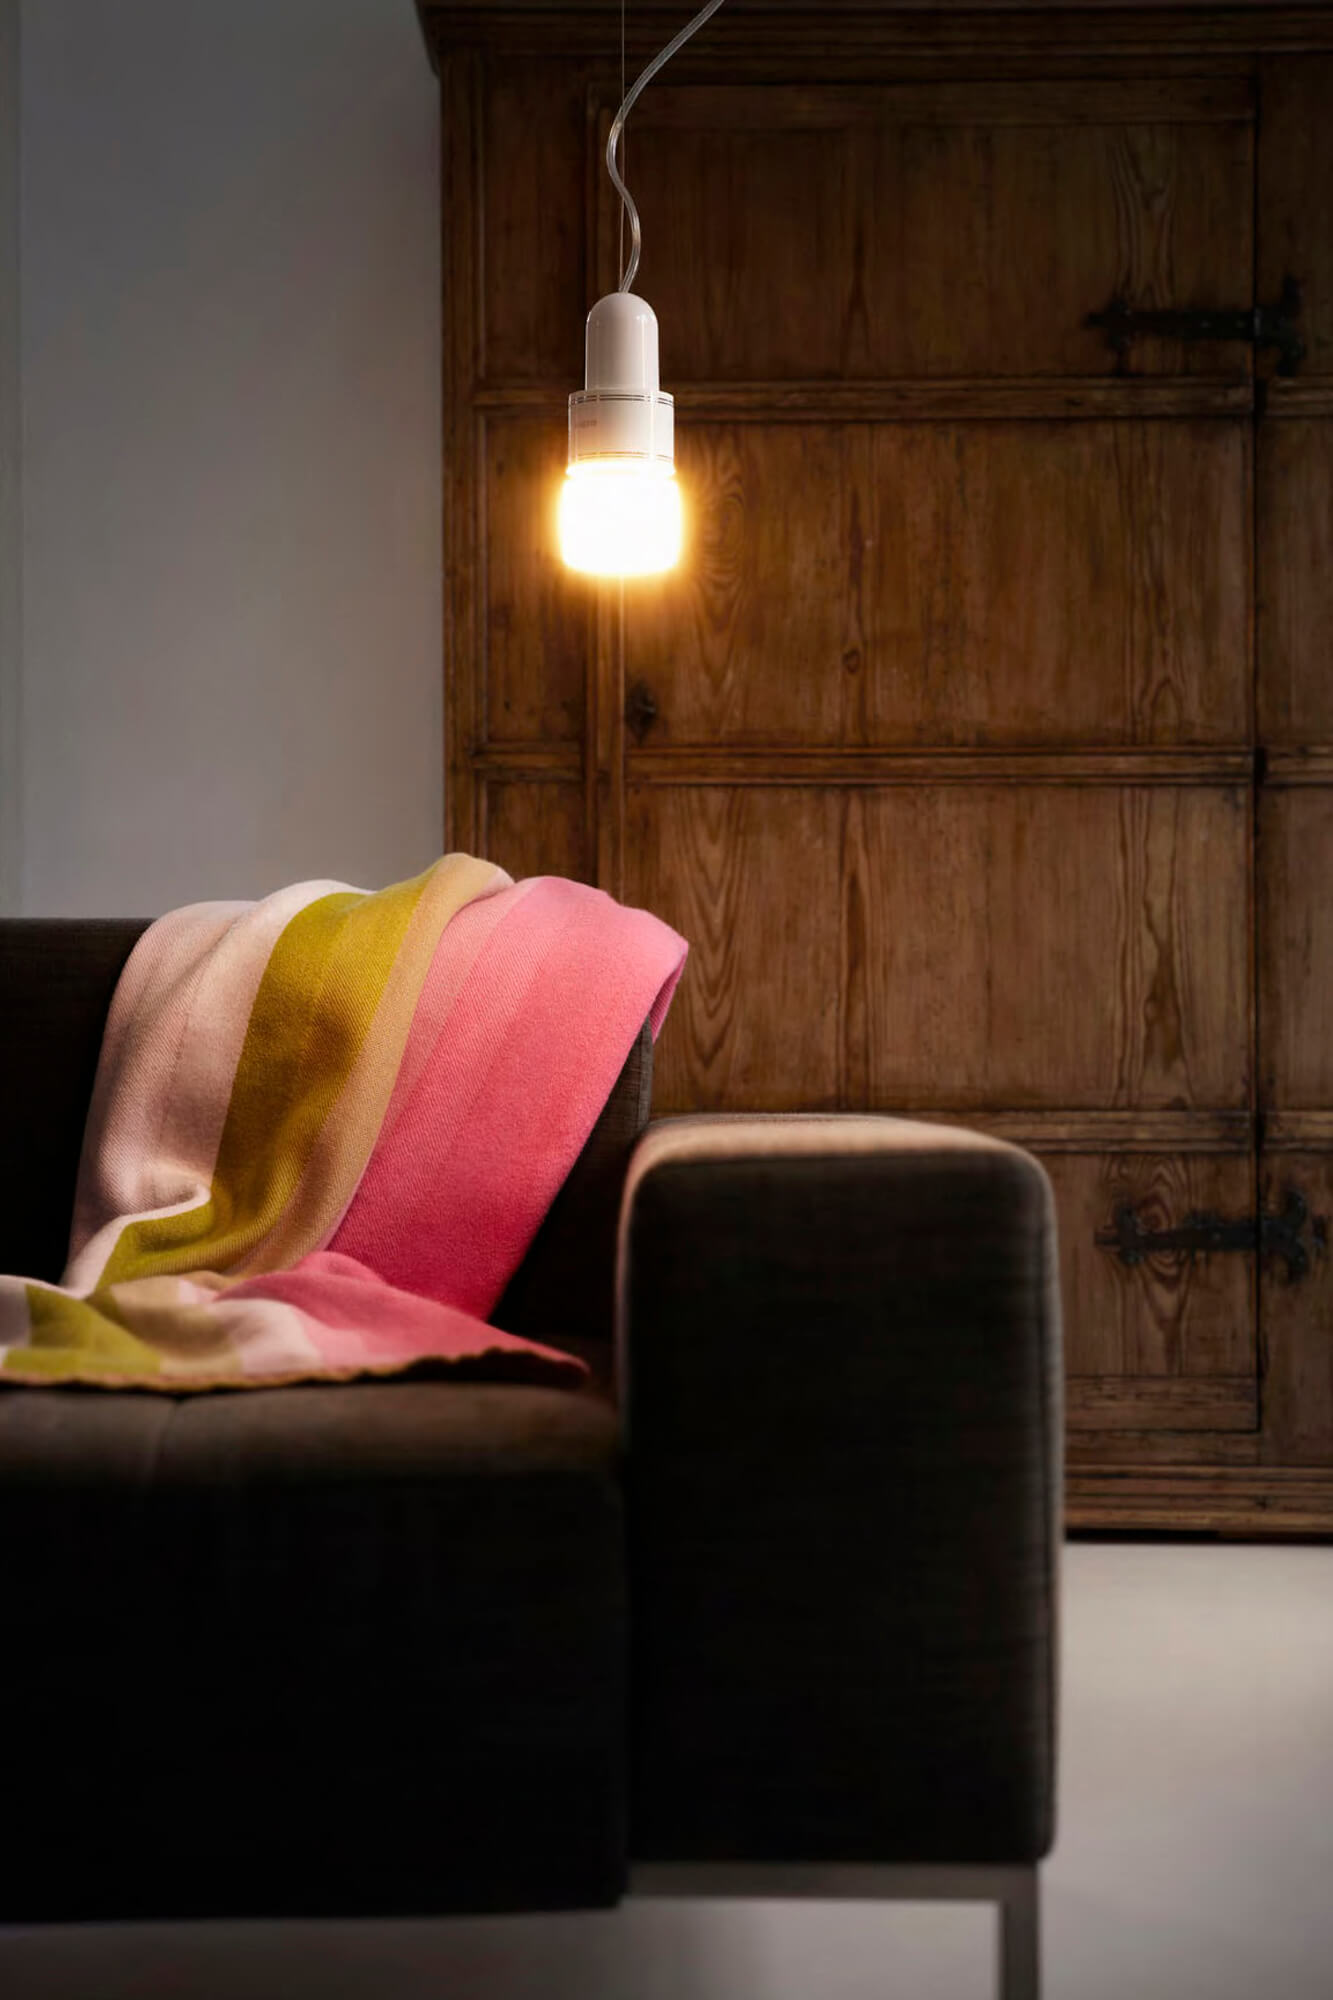 AlessiLux-TamTam-LED-light-bulb-with-sofa.jpg